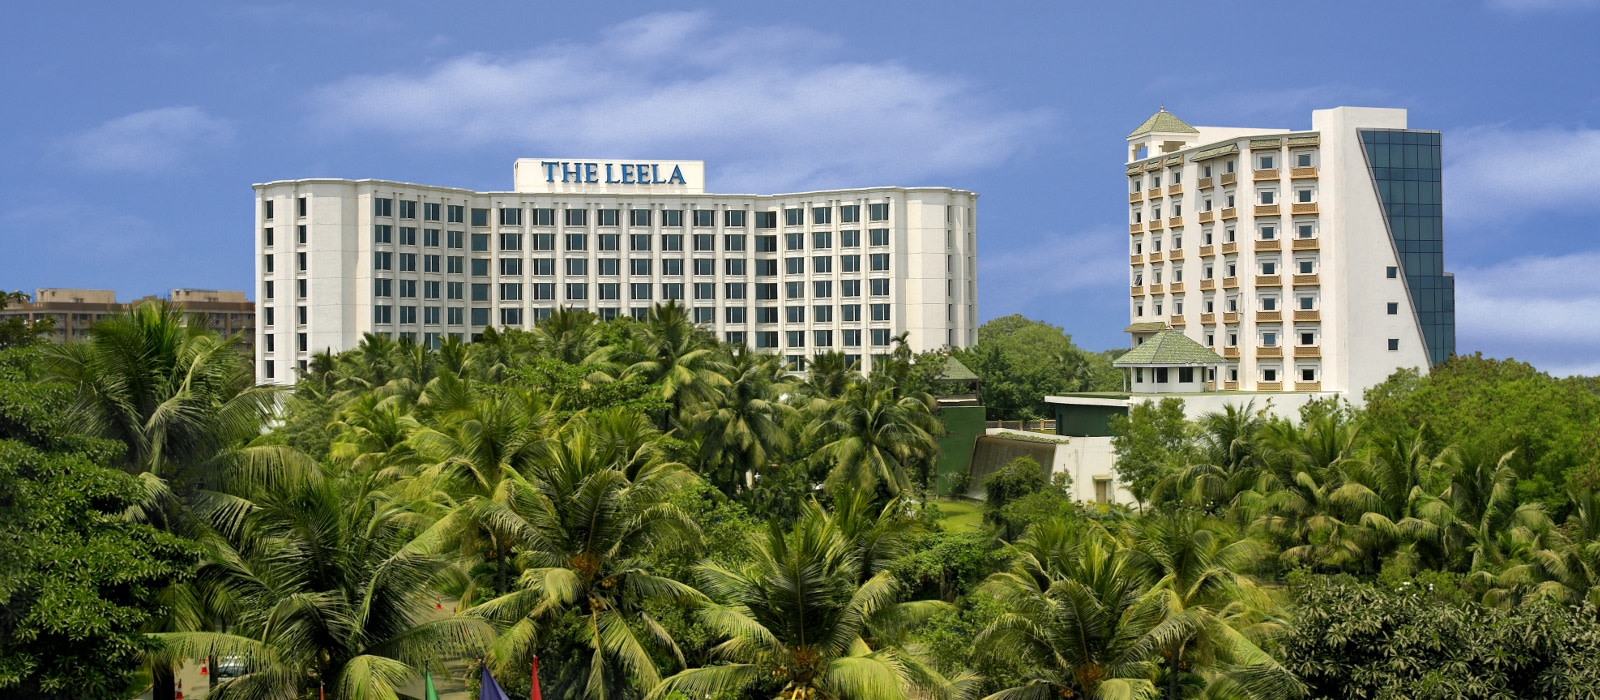 Hotel Leela Kempinski Zentral- & Westindien